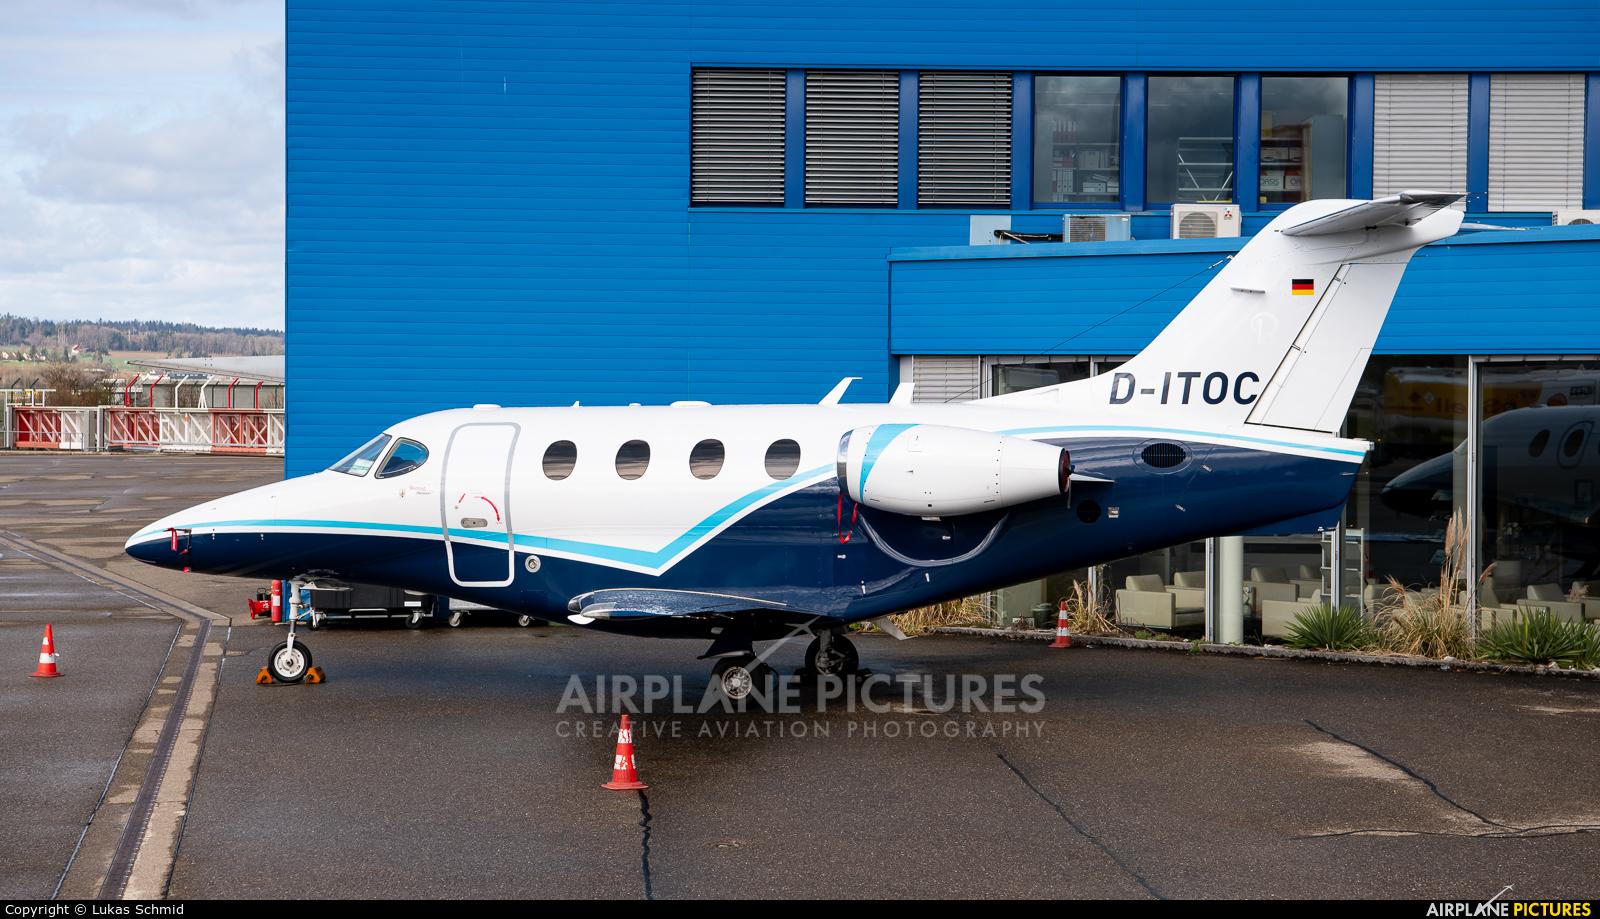 Exxaero D-ITOC aircraft at Zurich